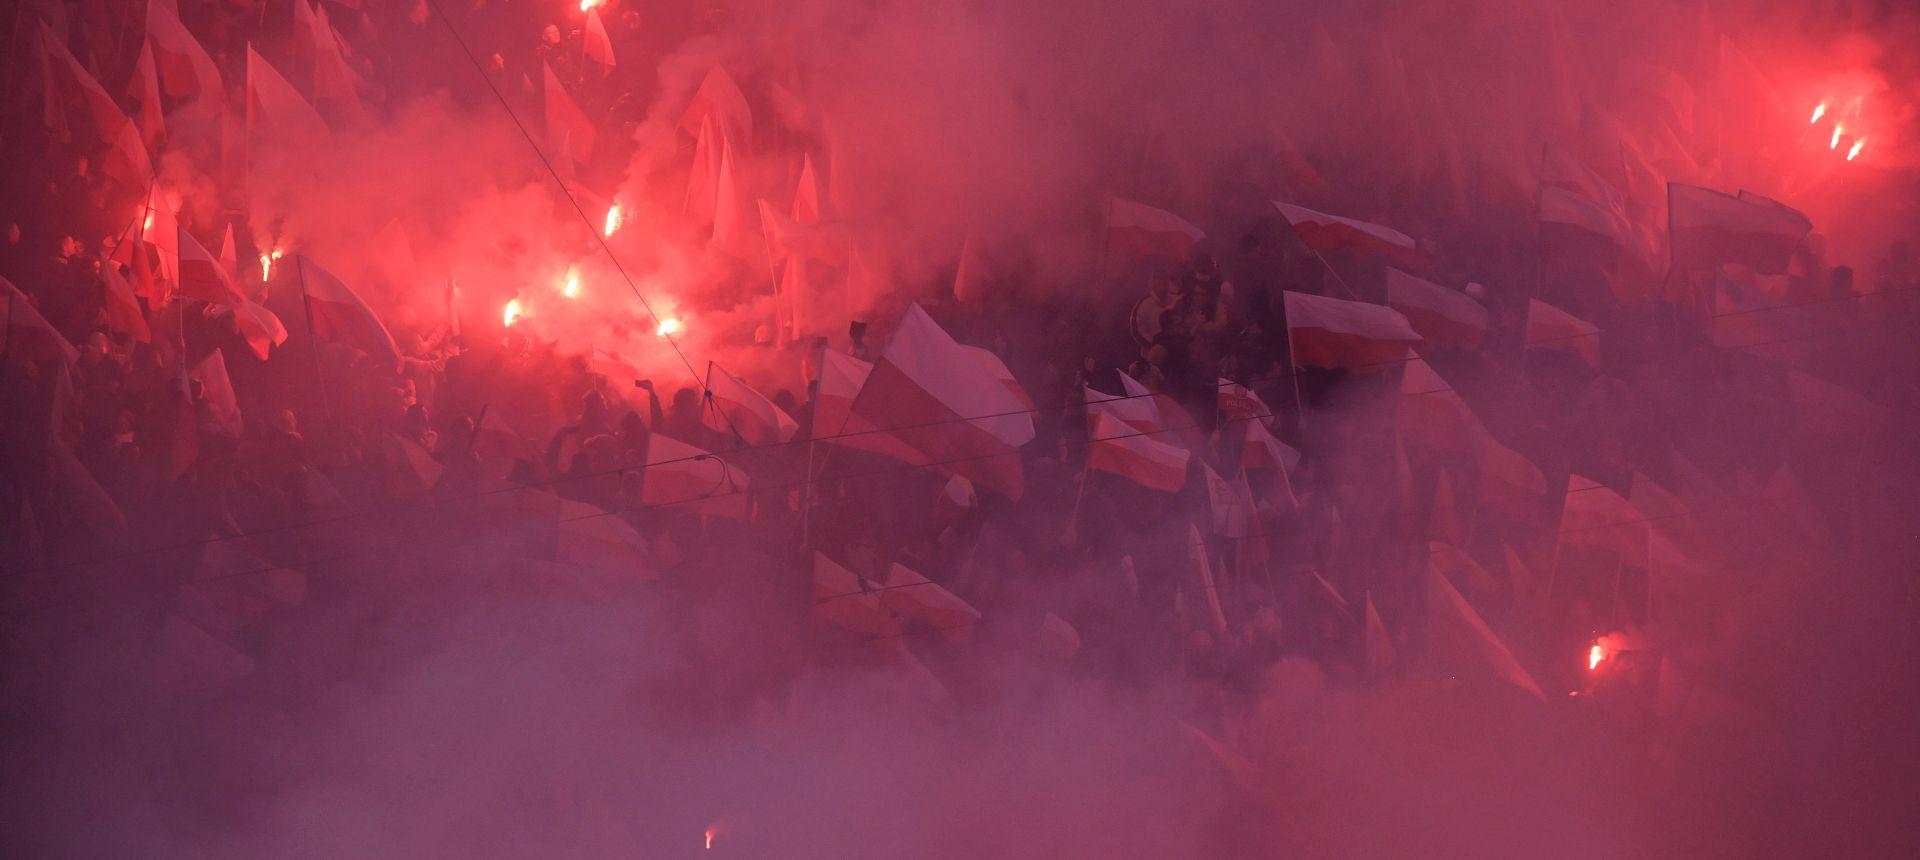 POLJSKA Vatrena proslava 100. obljetnice neovisnosti